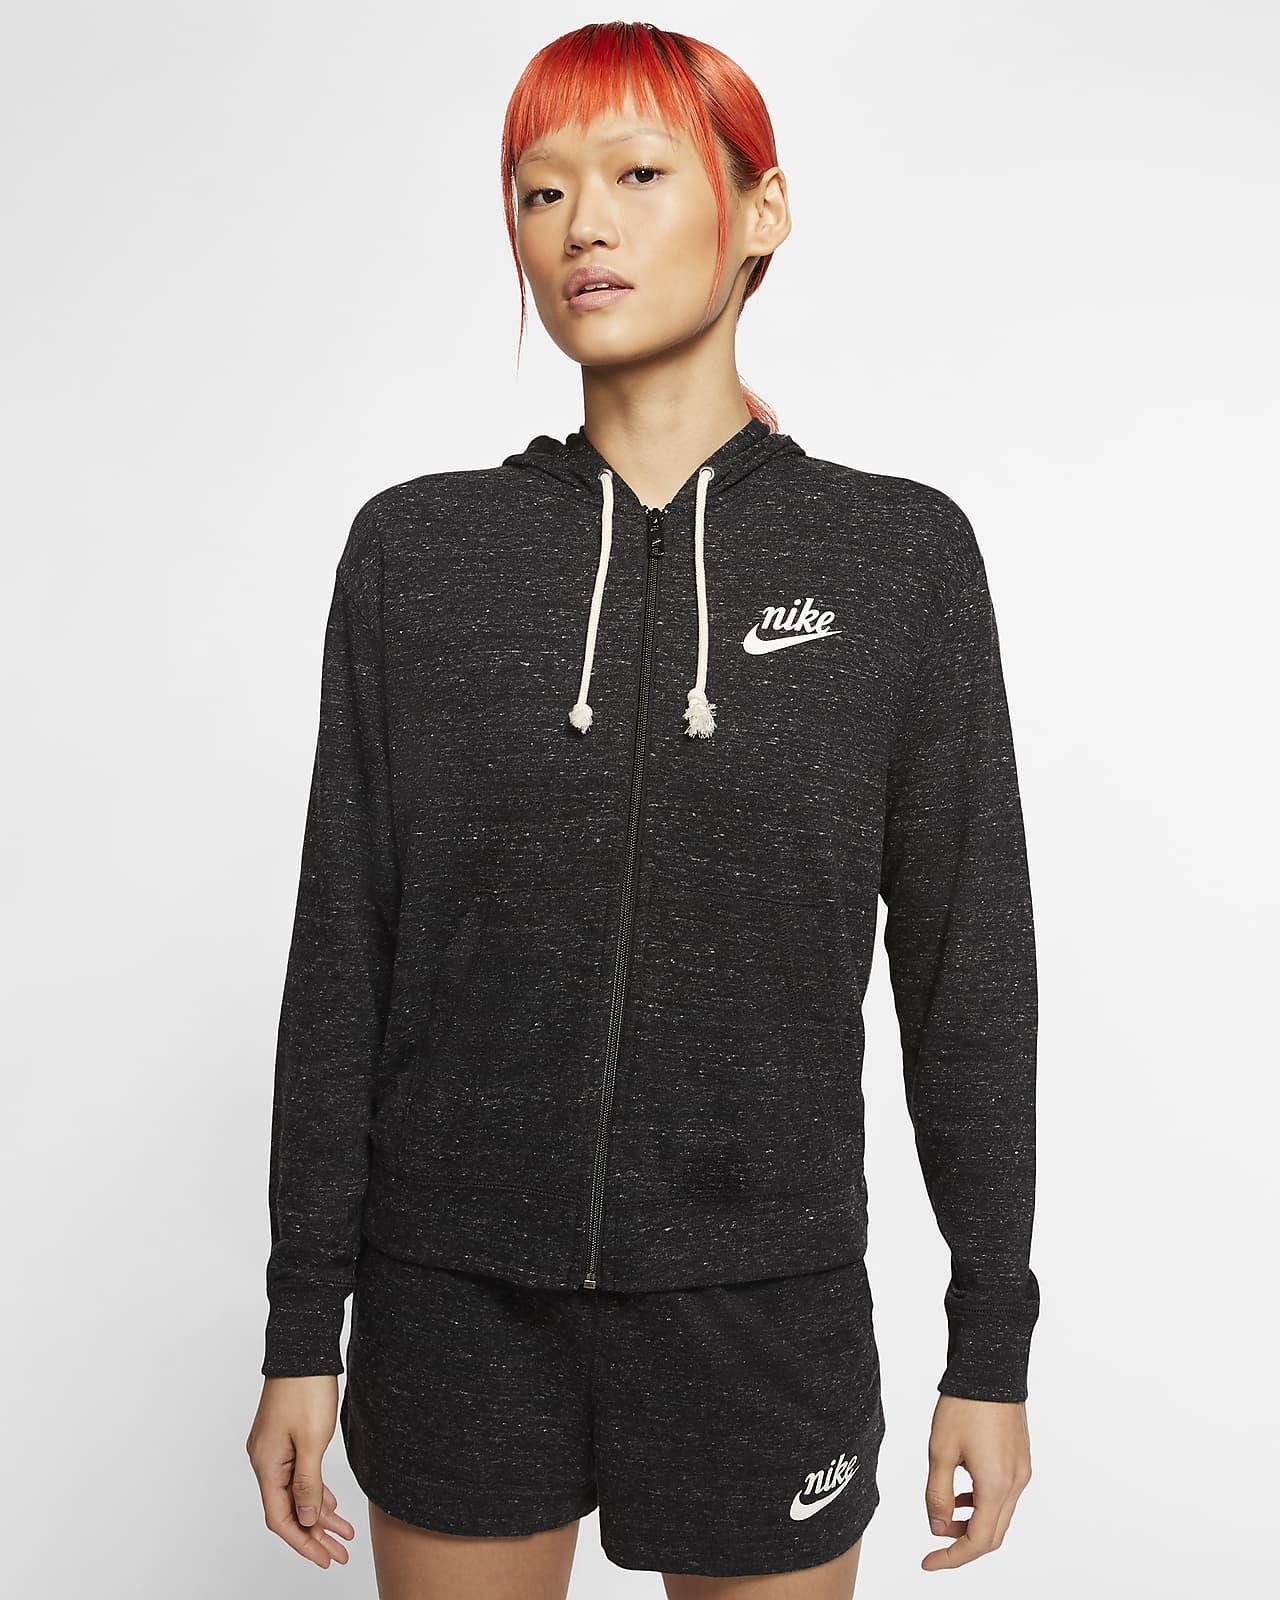 Fundación Mono limpiador  Felpa con cappuccio e zip a tutta lunghezza Nike Sportswear Gym Vintage -  Donna. Nike IT